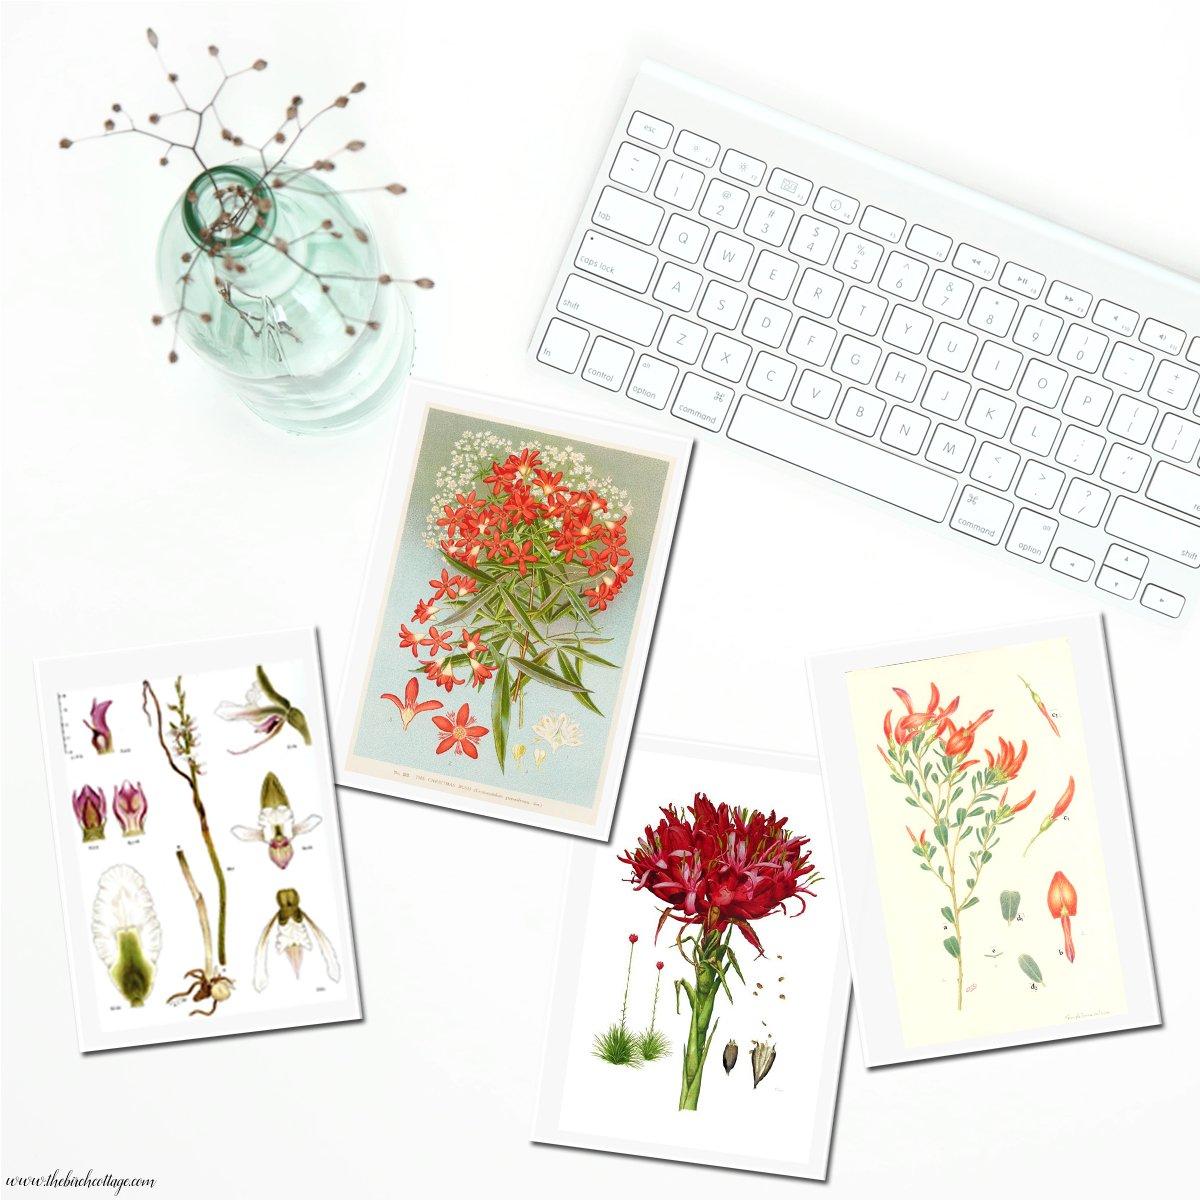 Vintage Botanical Illustrations printable cards from The Birch Cottage. Set 2